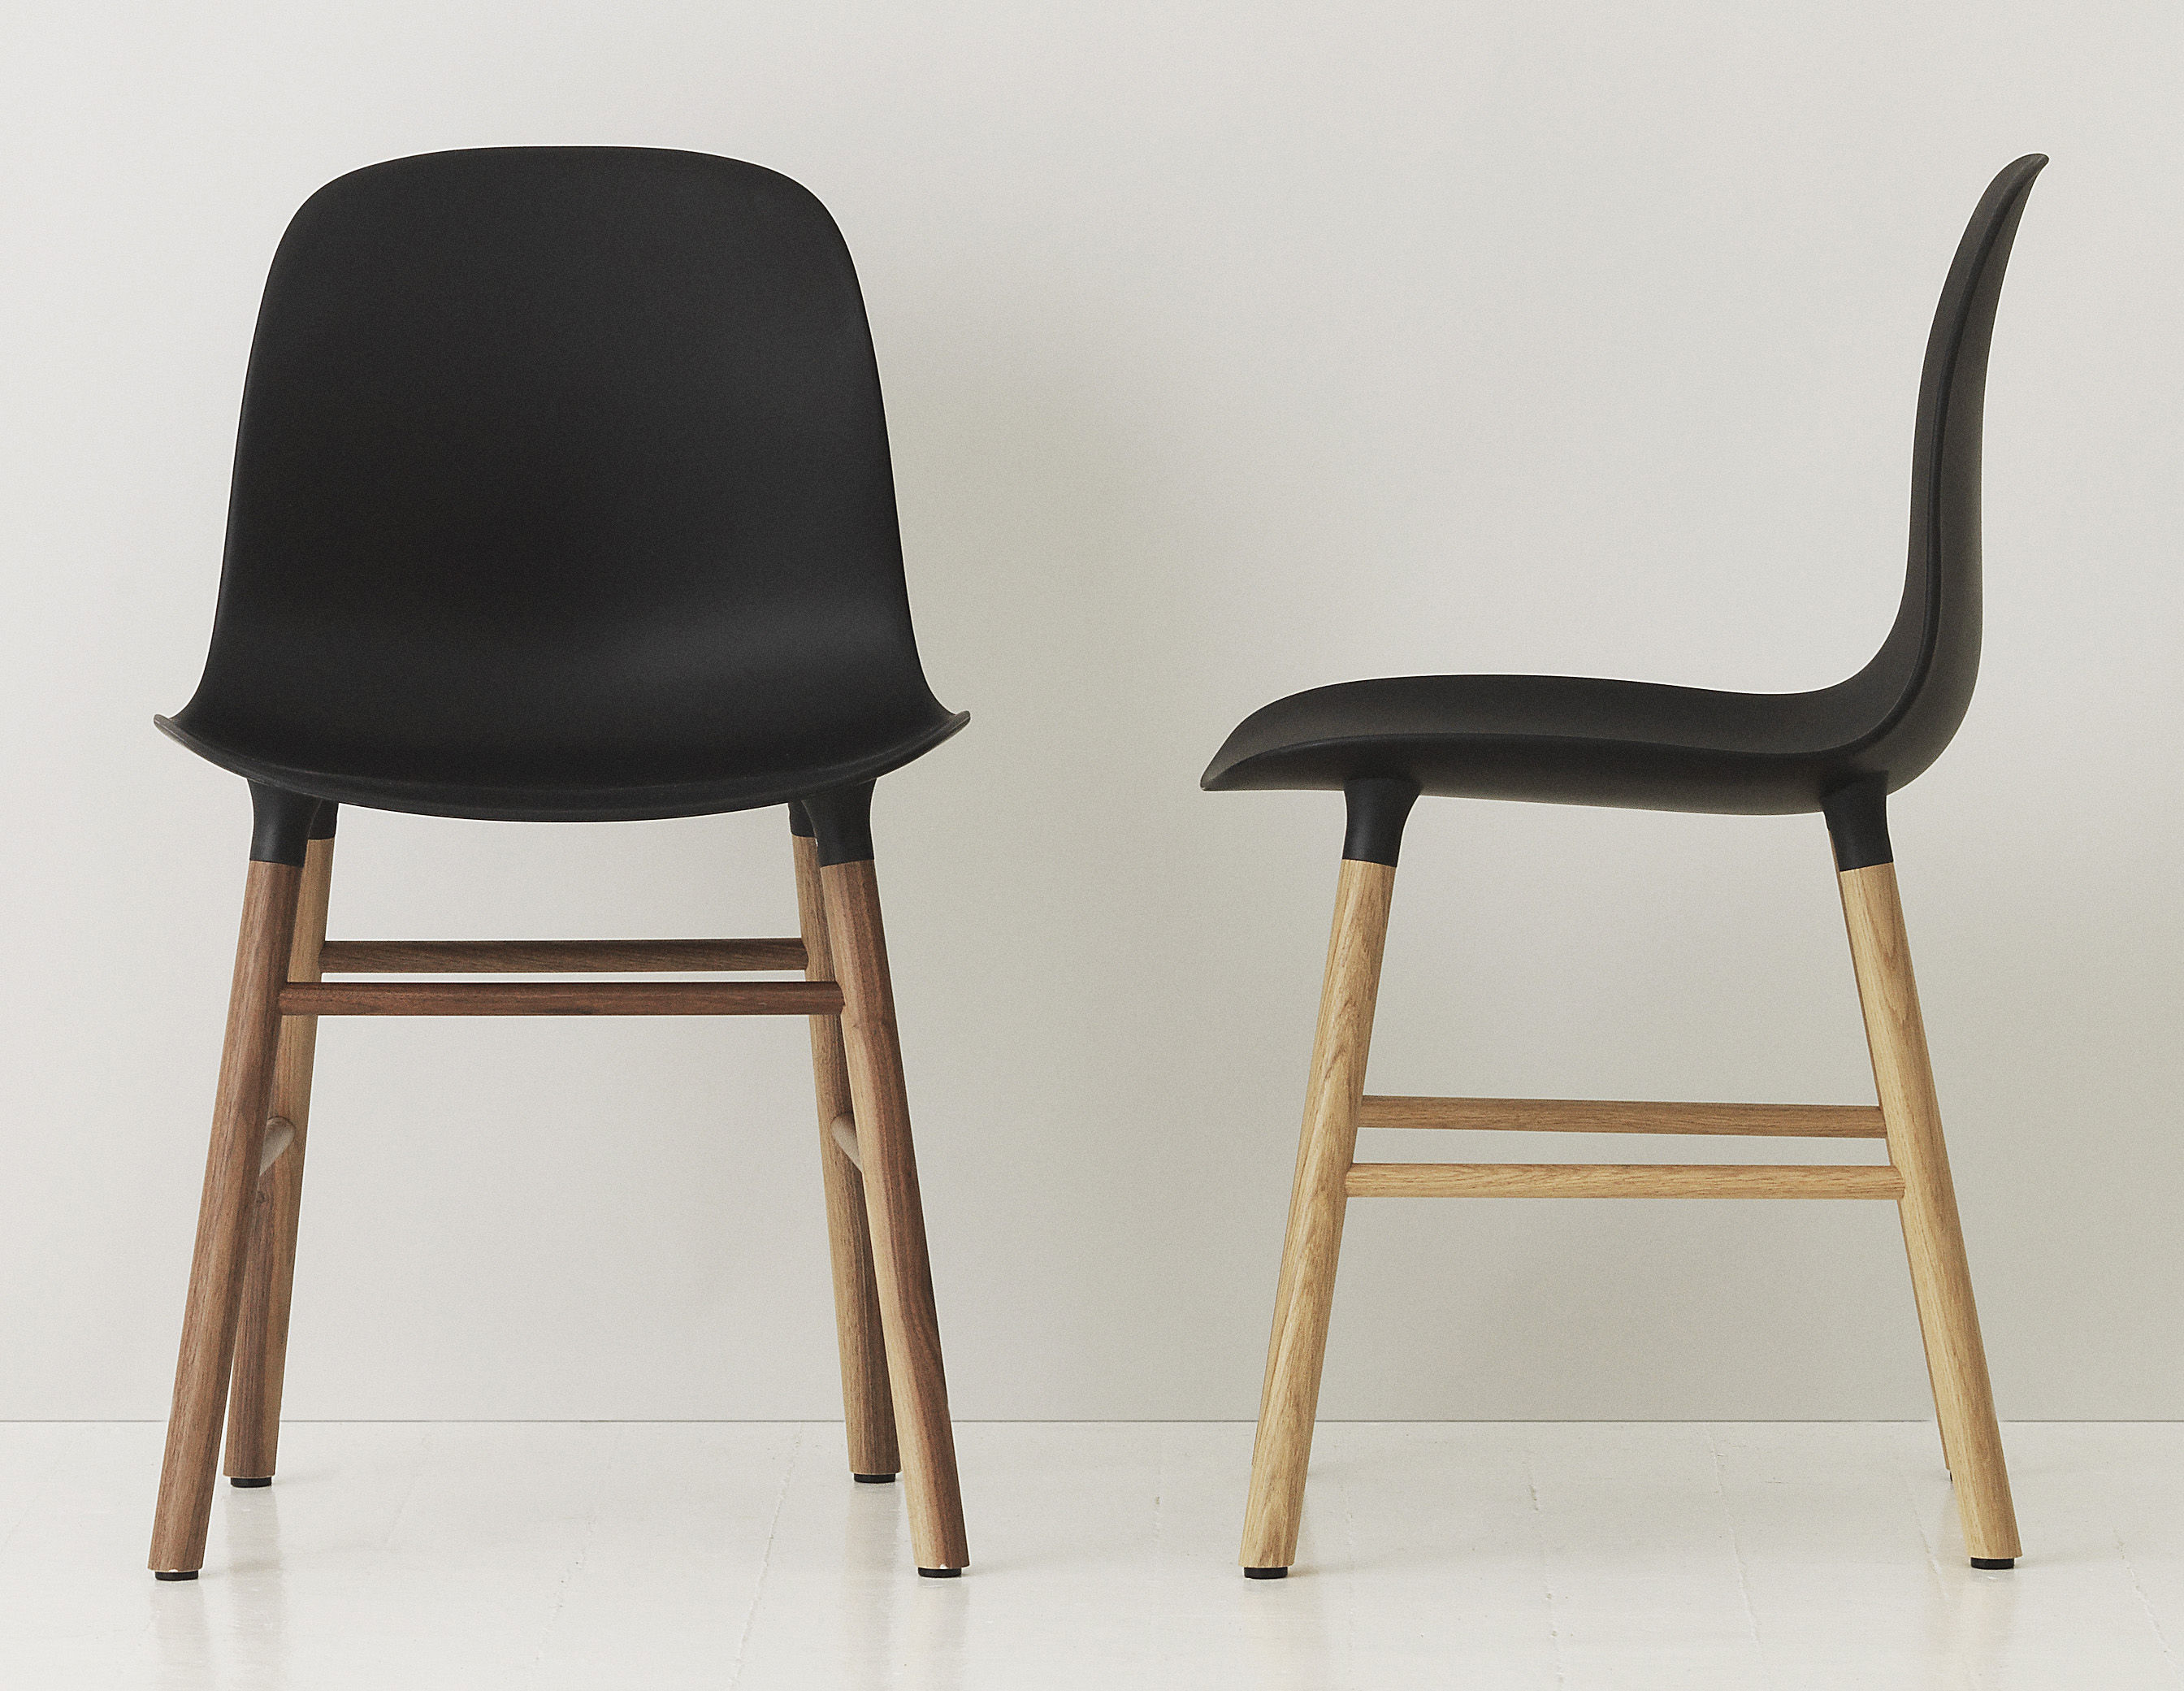 chaise form pied noyer noir noyer normann copenhagen. Black Bedroom Furniture Sets. Home Design Ideas